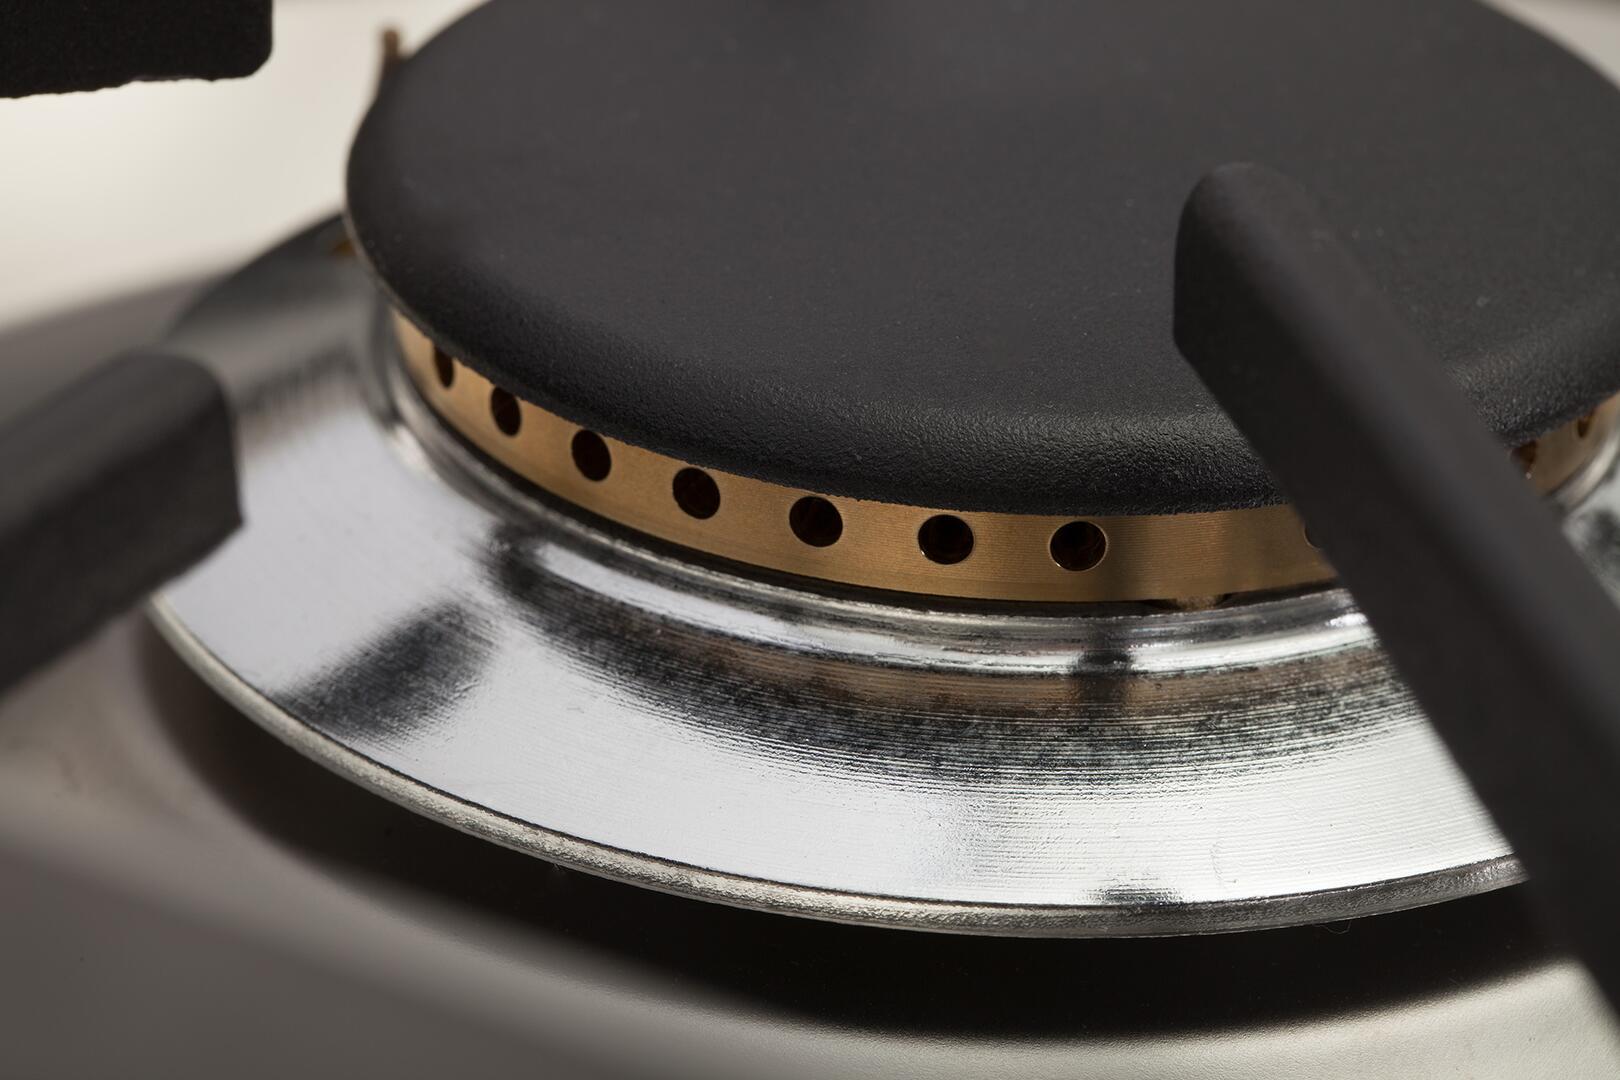 Ilve Nostalgie UPDN100FDMPNLP Freestanding Dual Fuel Range Black, 19